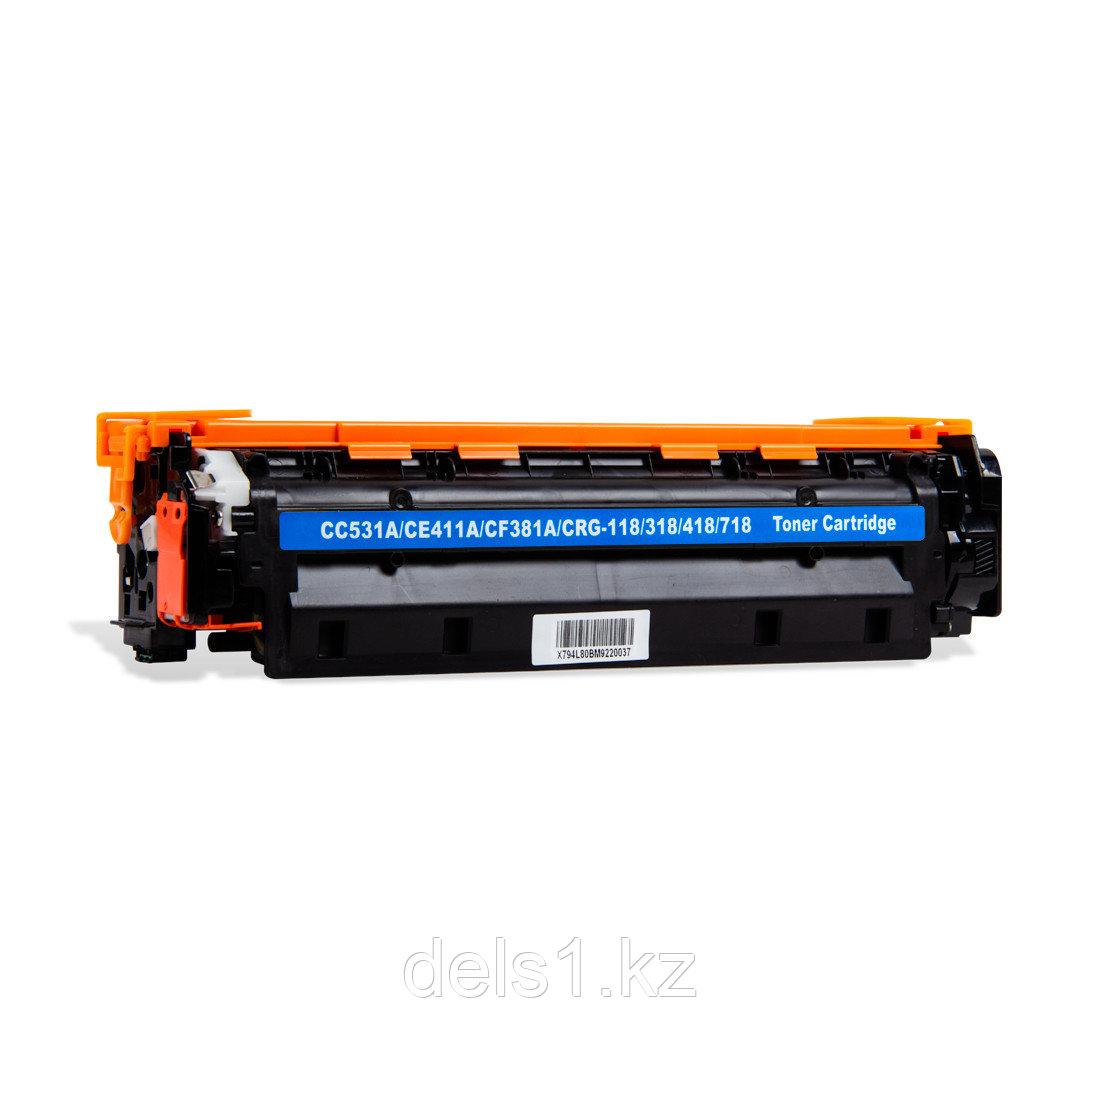 Картридж Colorfix CC531A/CE411A/CF381A, Синий, Для принтеров HP CLJ CP2020/2024/2025/2026/2027/2320